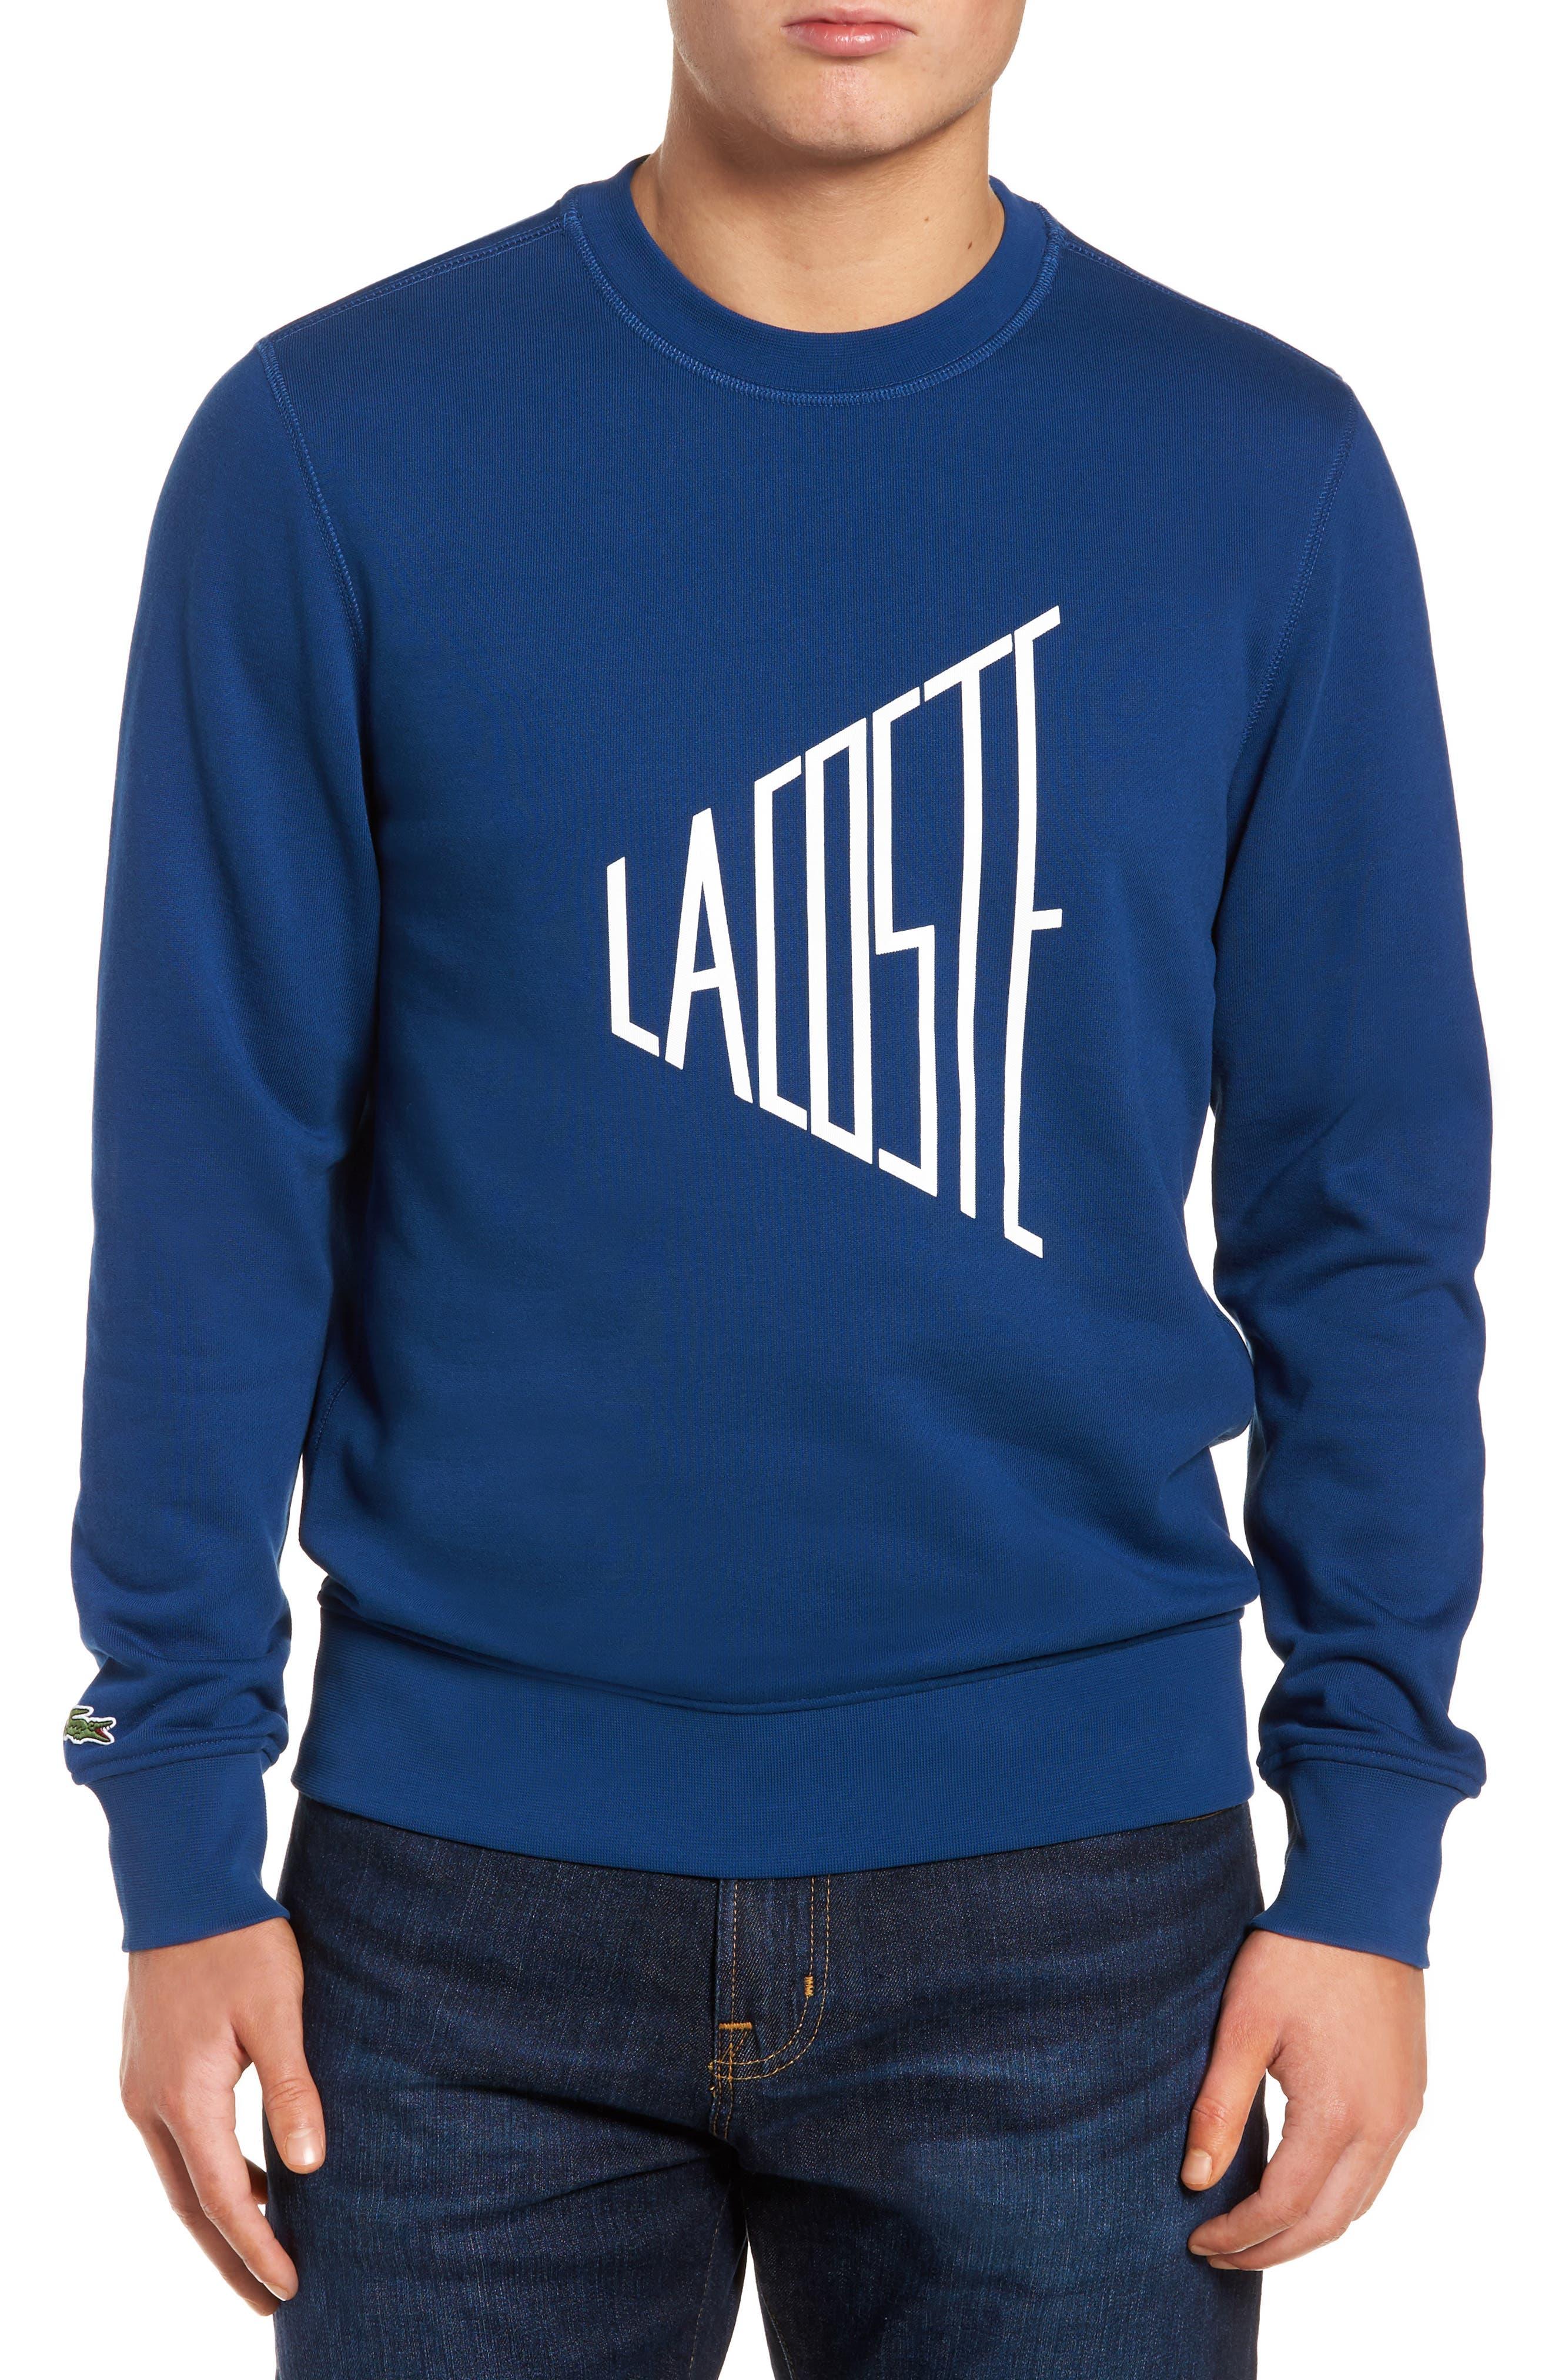 Alternate Image 1 Selected - Lacoste Lettering Fleece Sweatshirt